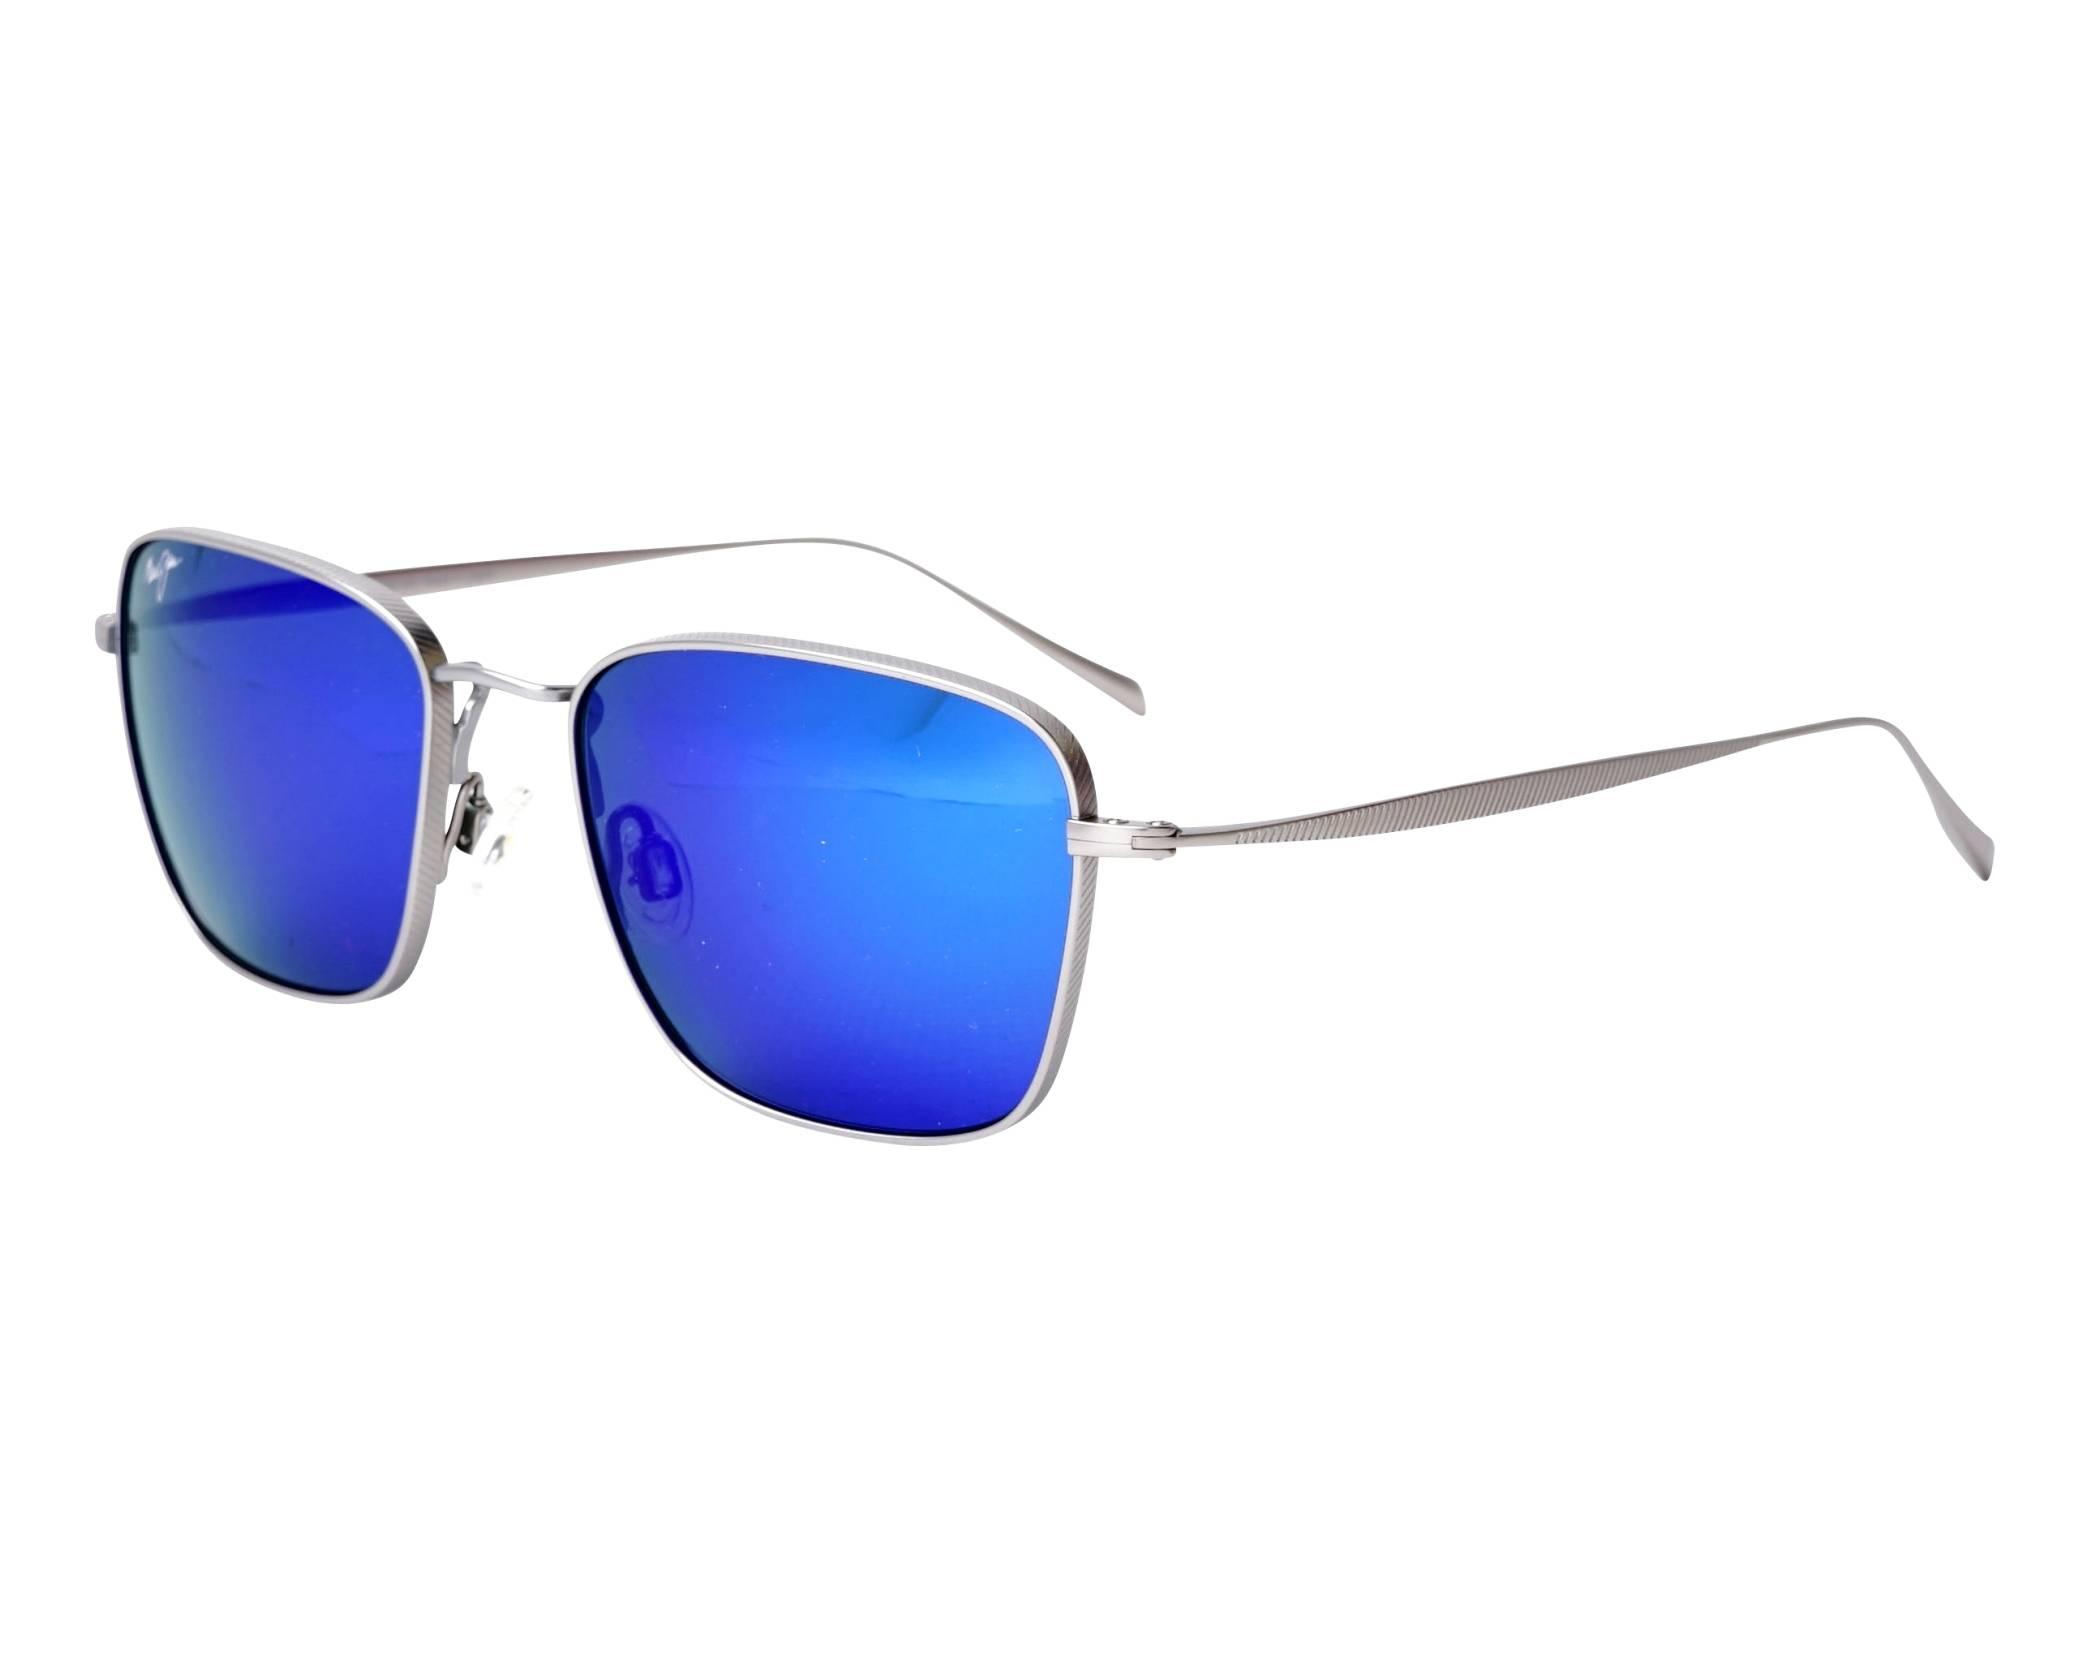 5d958aa6dea05 Sunglasses Maui Jim SPINNAKER B-545-11B 54-19 Ruthenium profile view